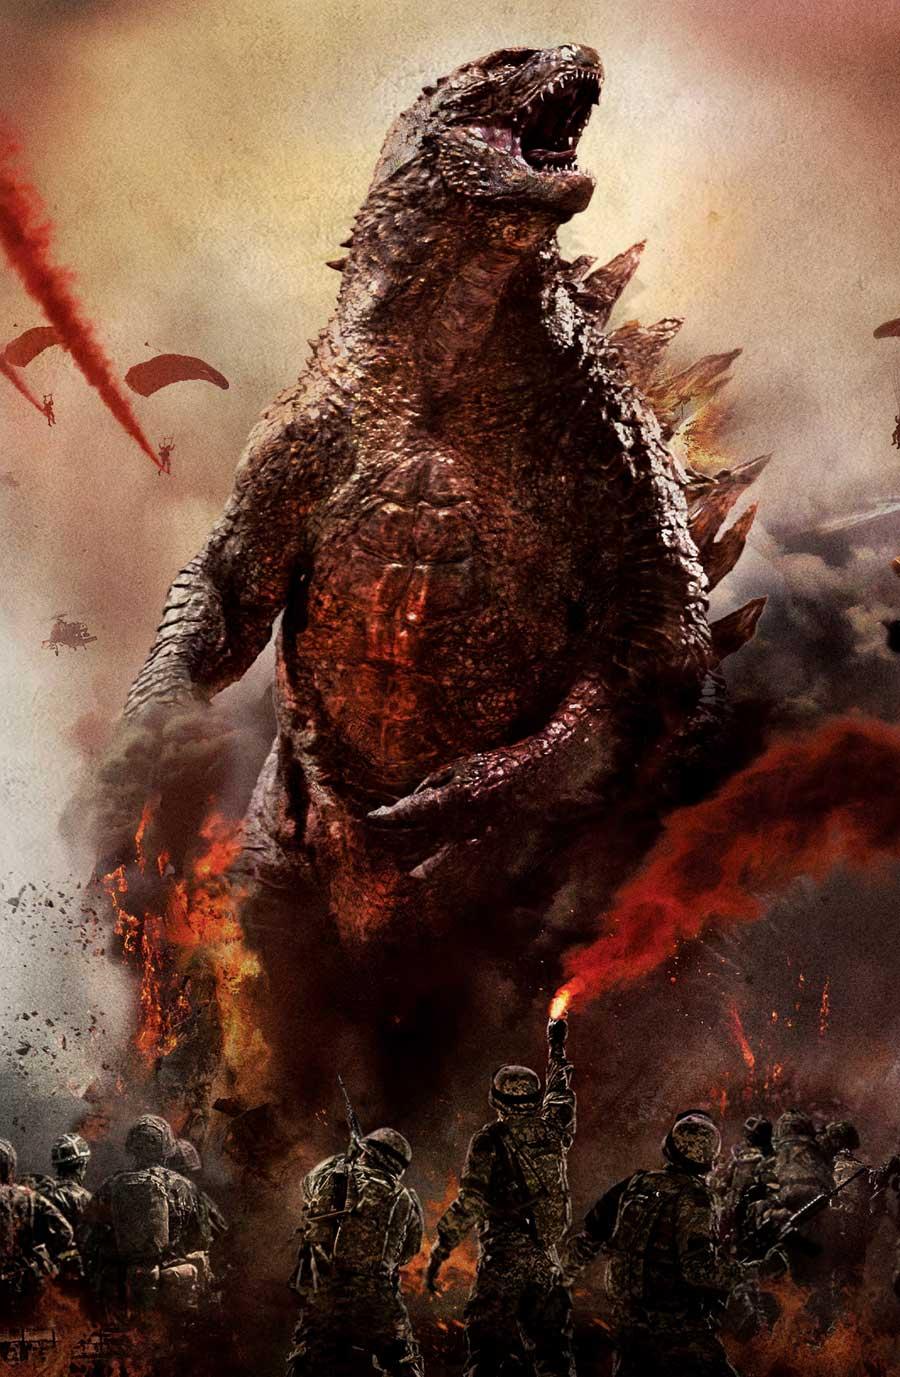 Godzilla 2014 Movie Wallpapers | HD Wallpapers